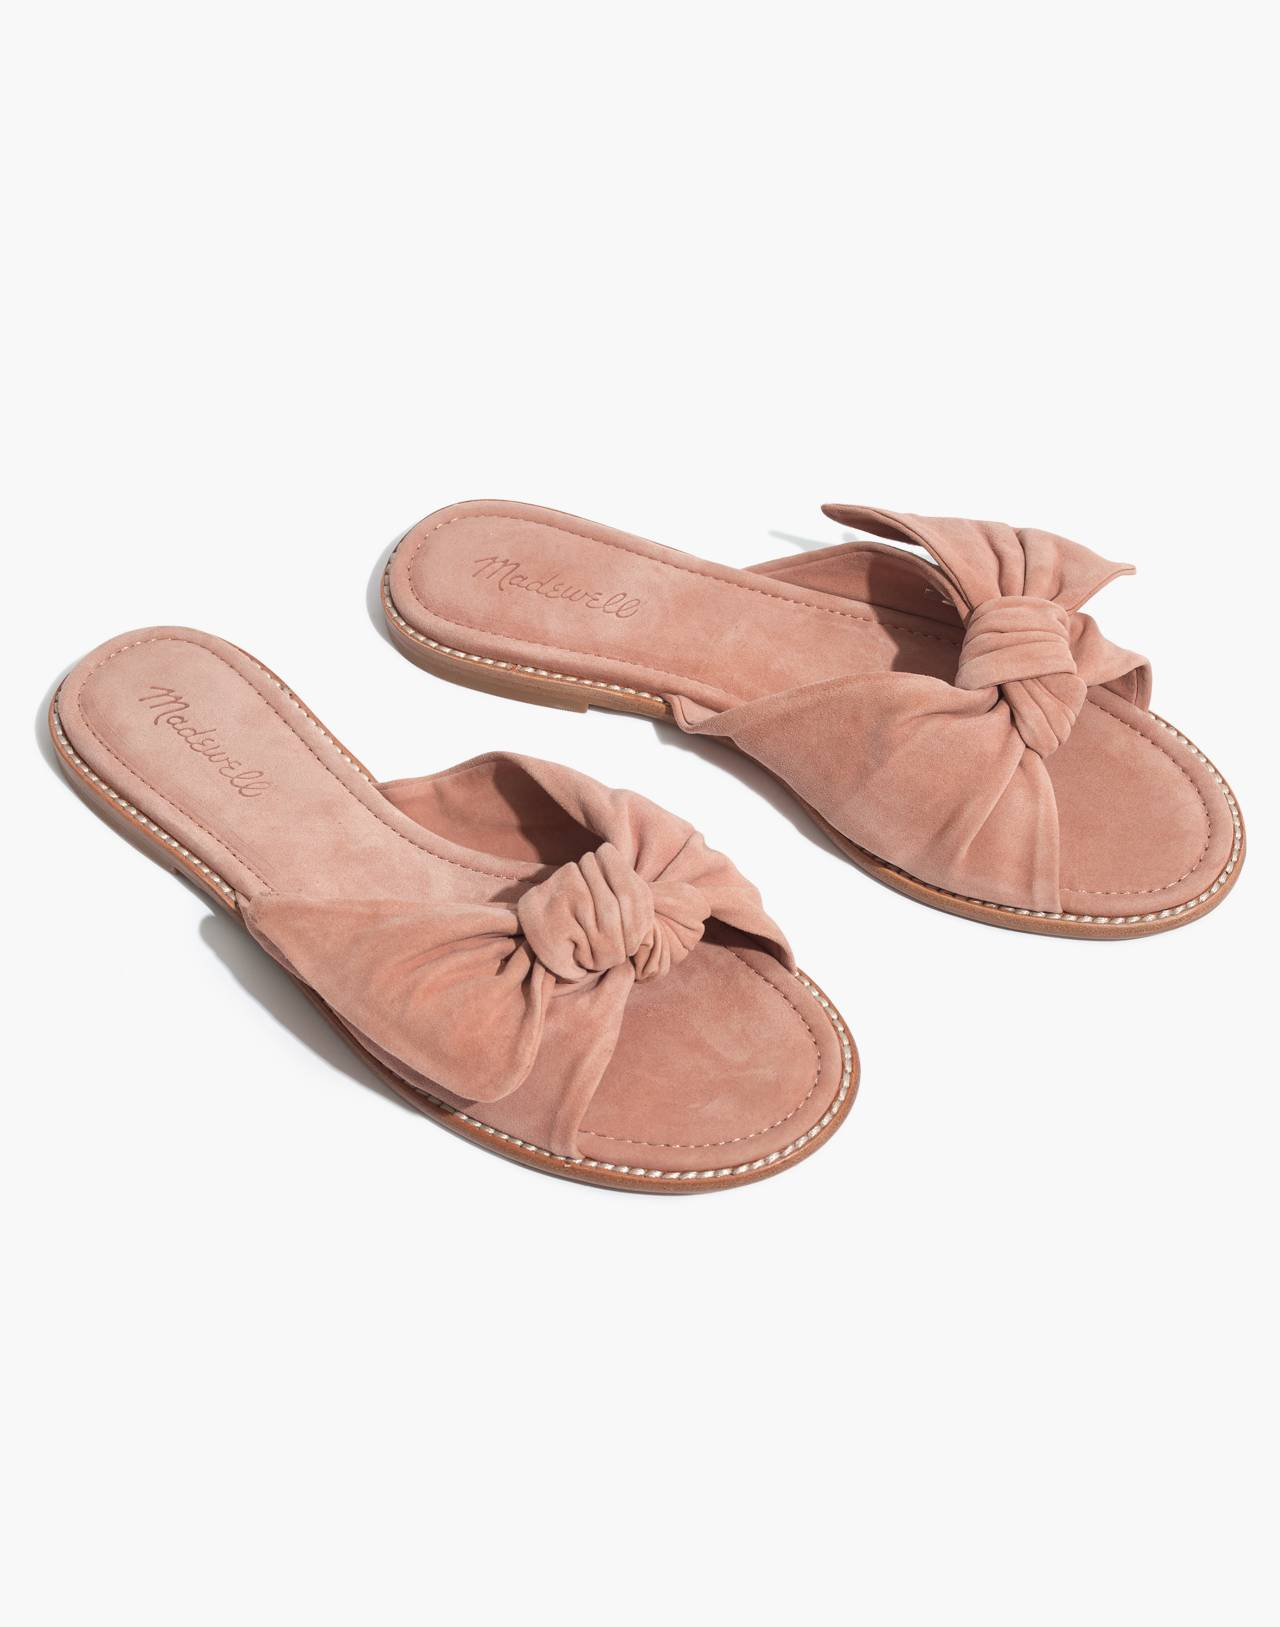 The Naida Half-Bow Sandal in dusty clay image 1